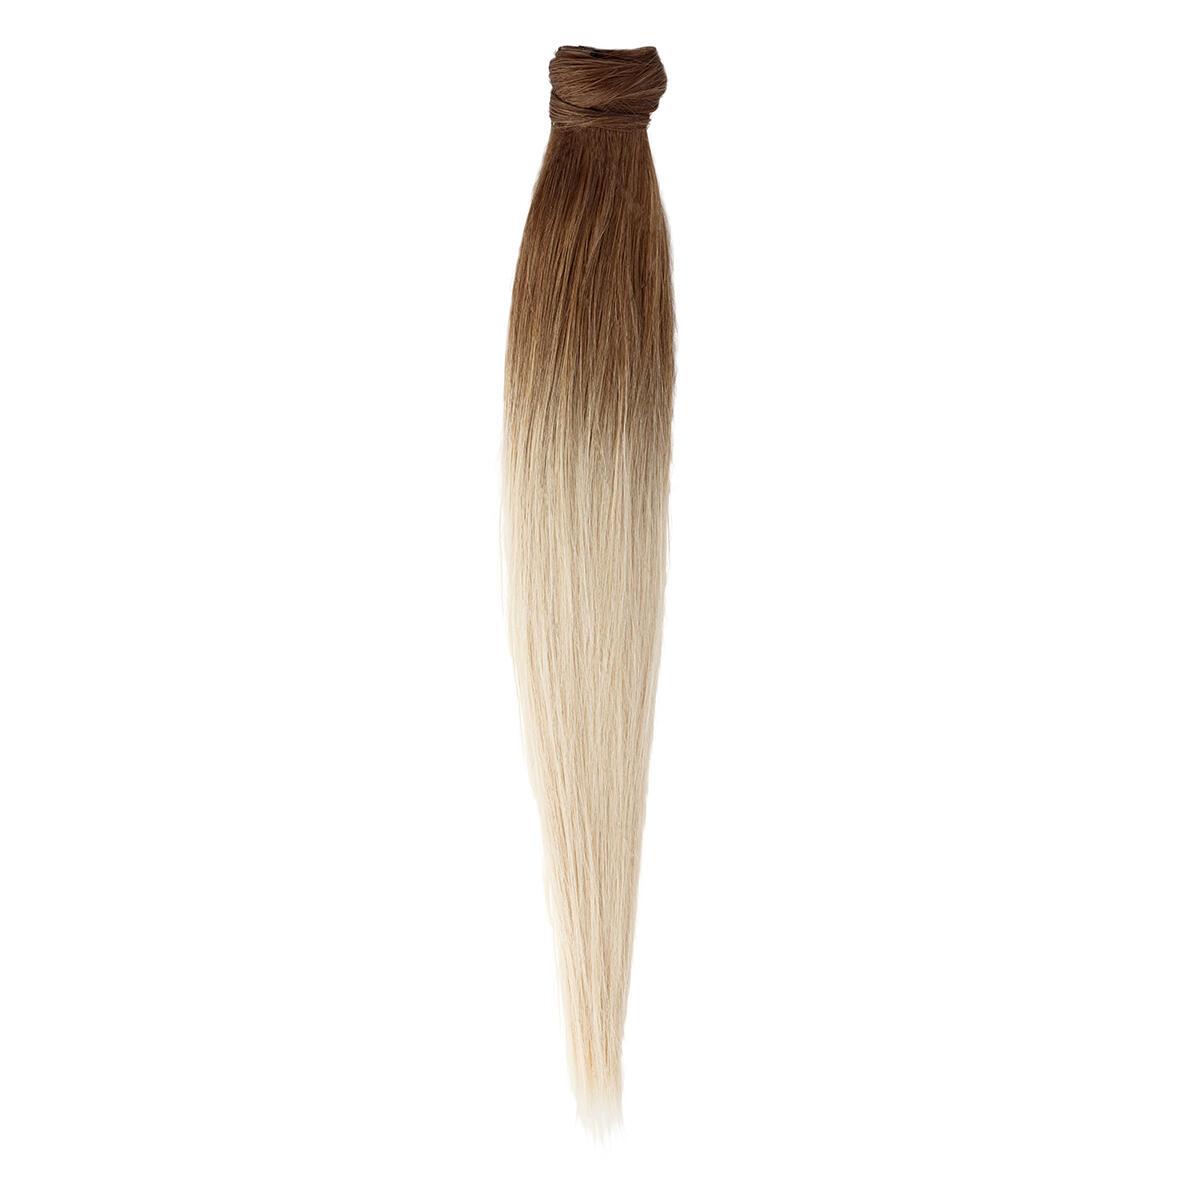 Clip-in Ponytail Original O5.1/10.8 Medium Ash Blond Ombre 40 cm